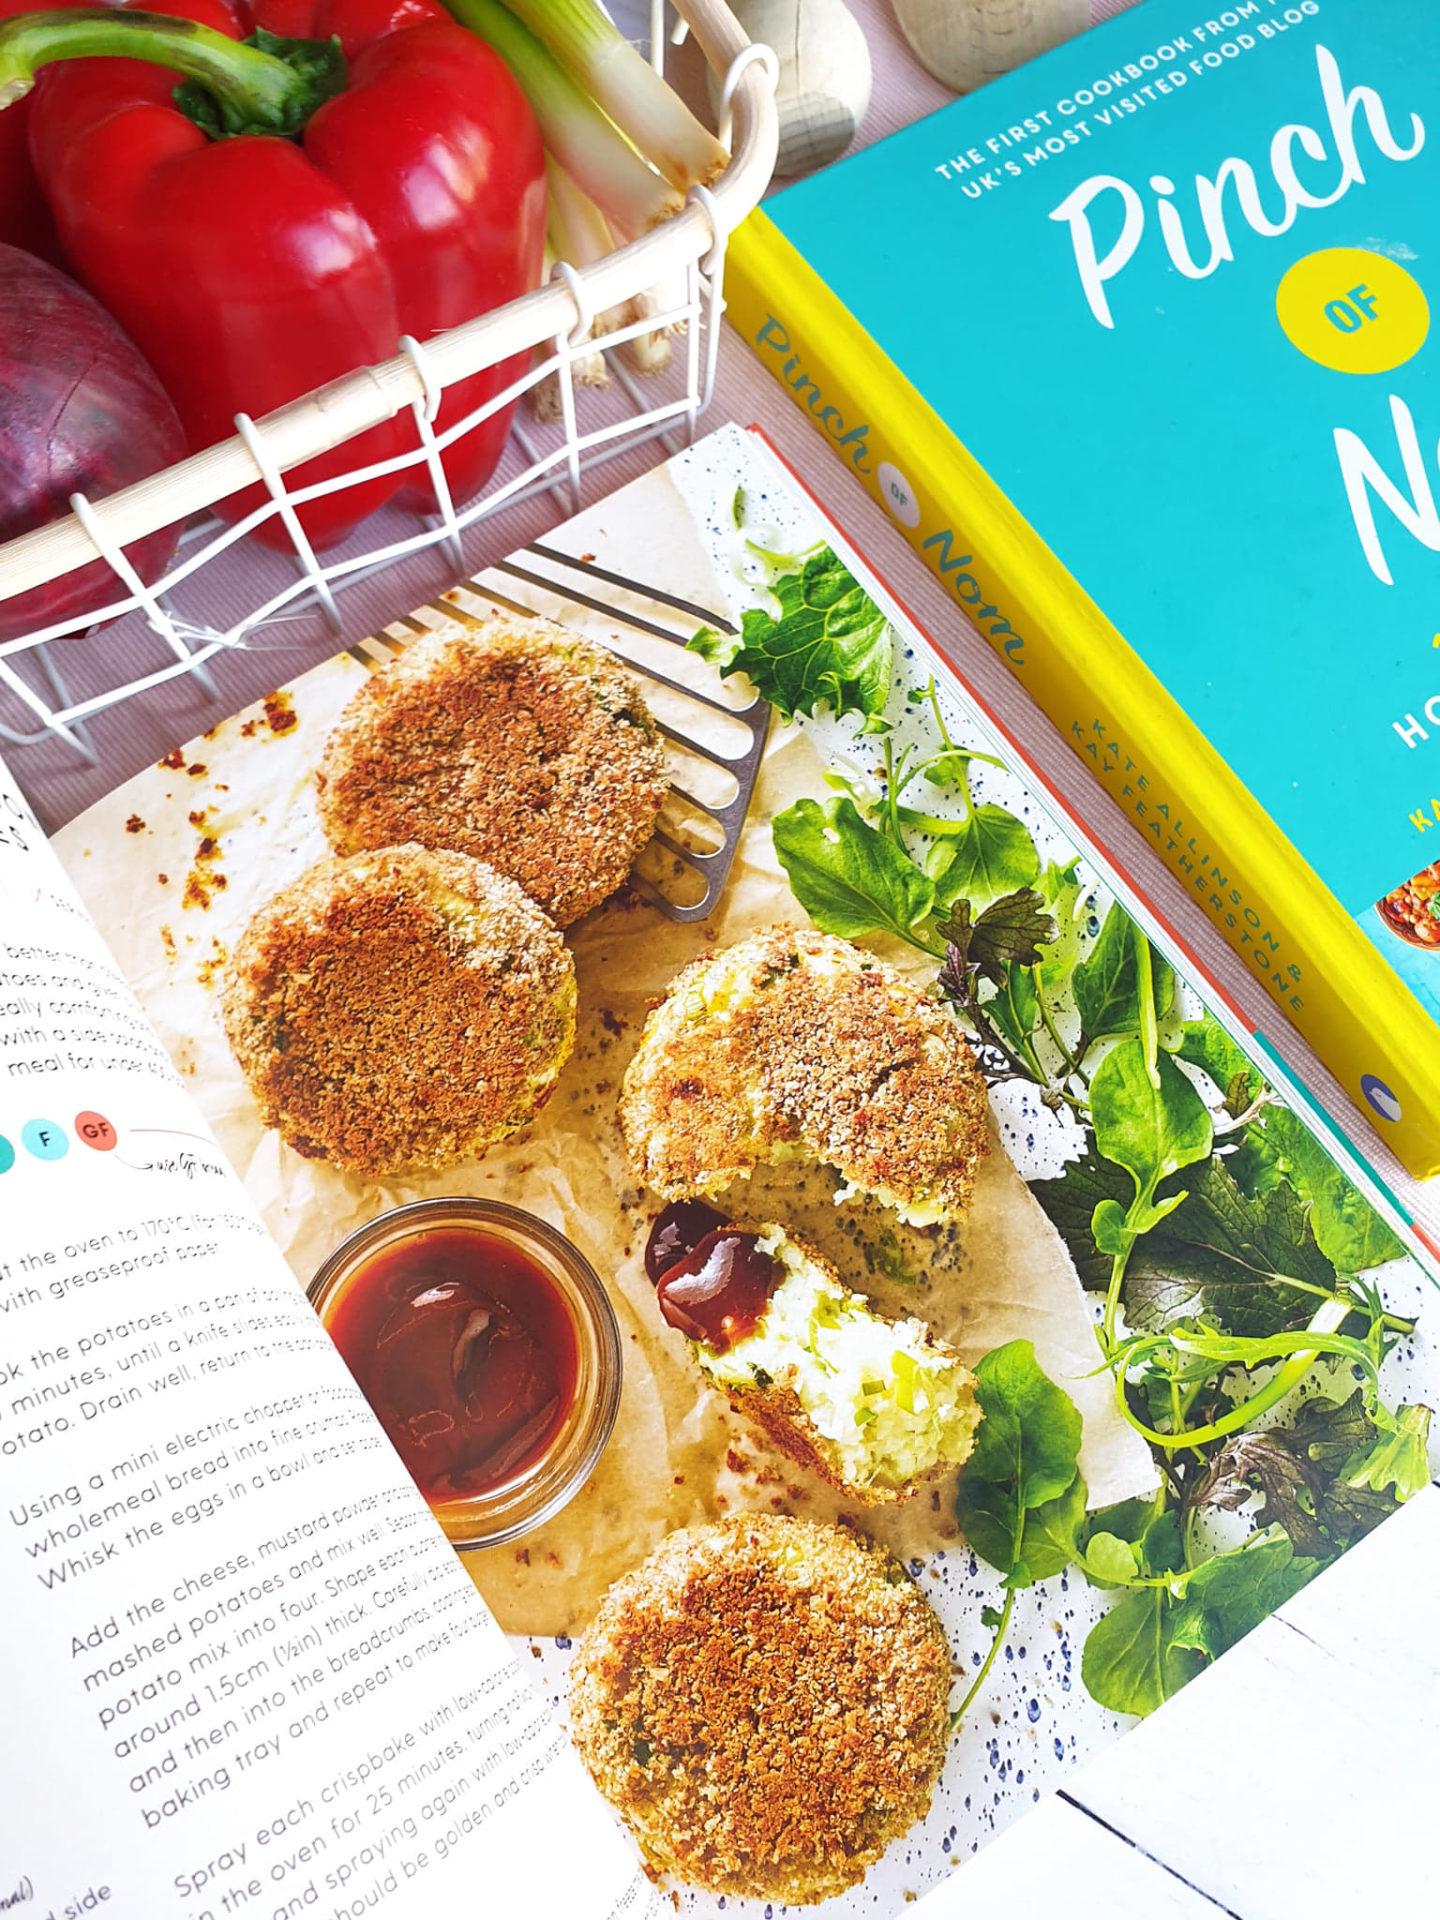 Pinch of Nom | Recipes I've Made So Far...